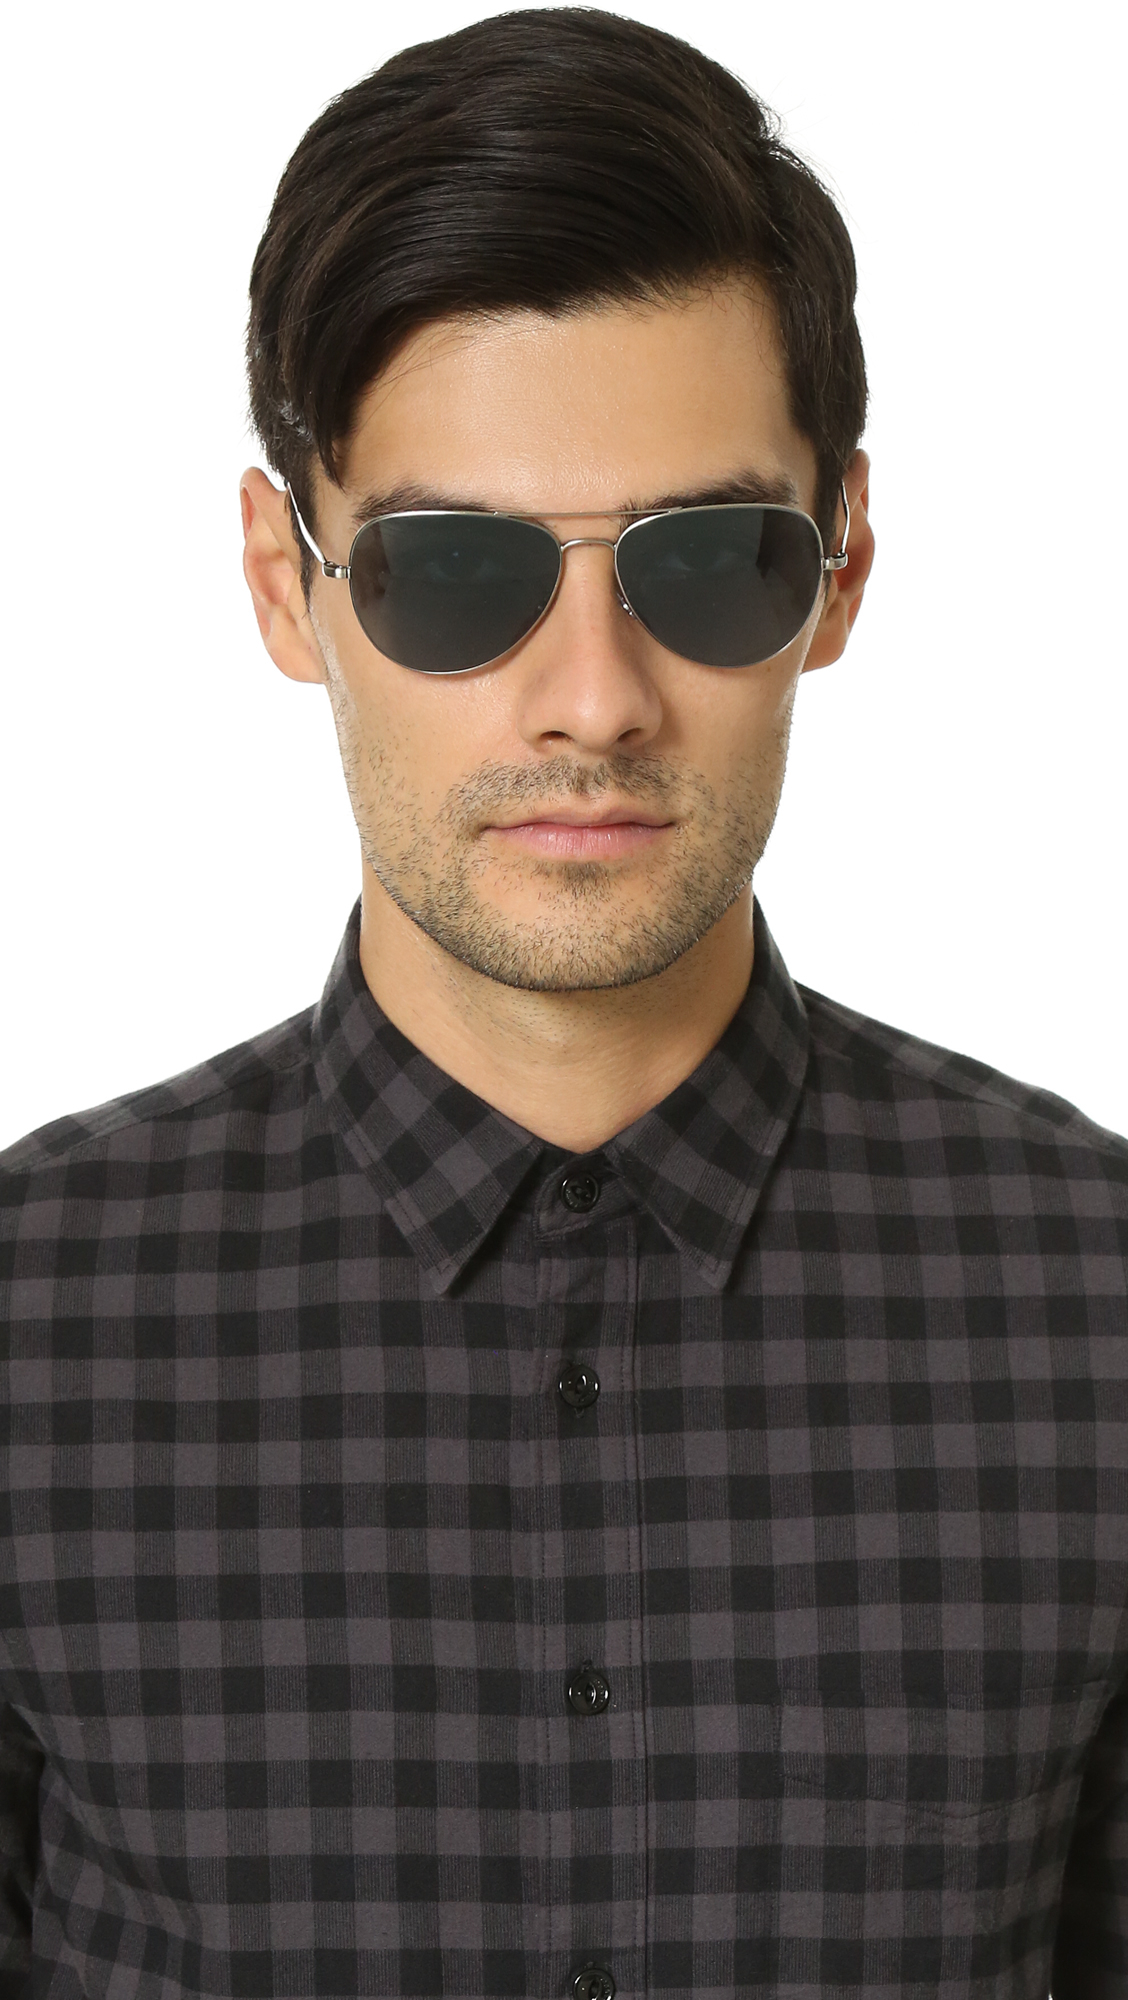 875b4e01744 Paul Smith Eyeglasses Men